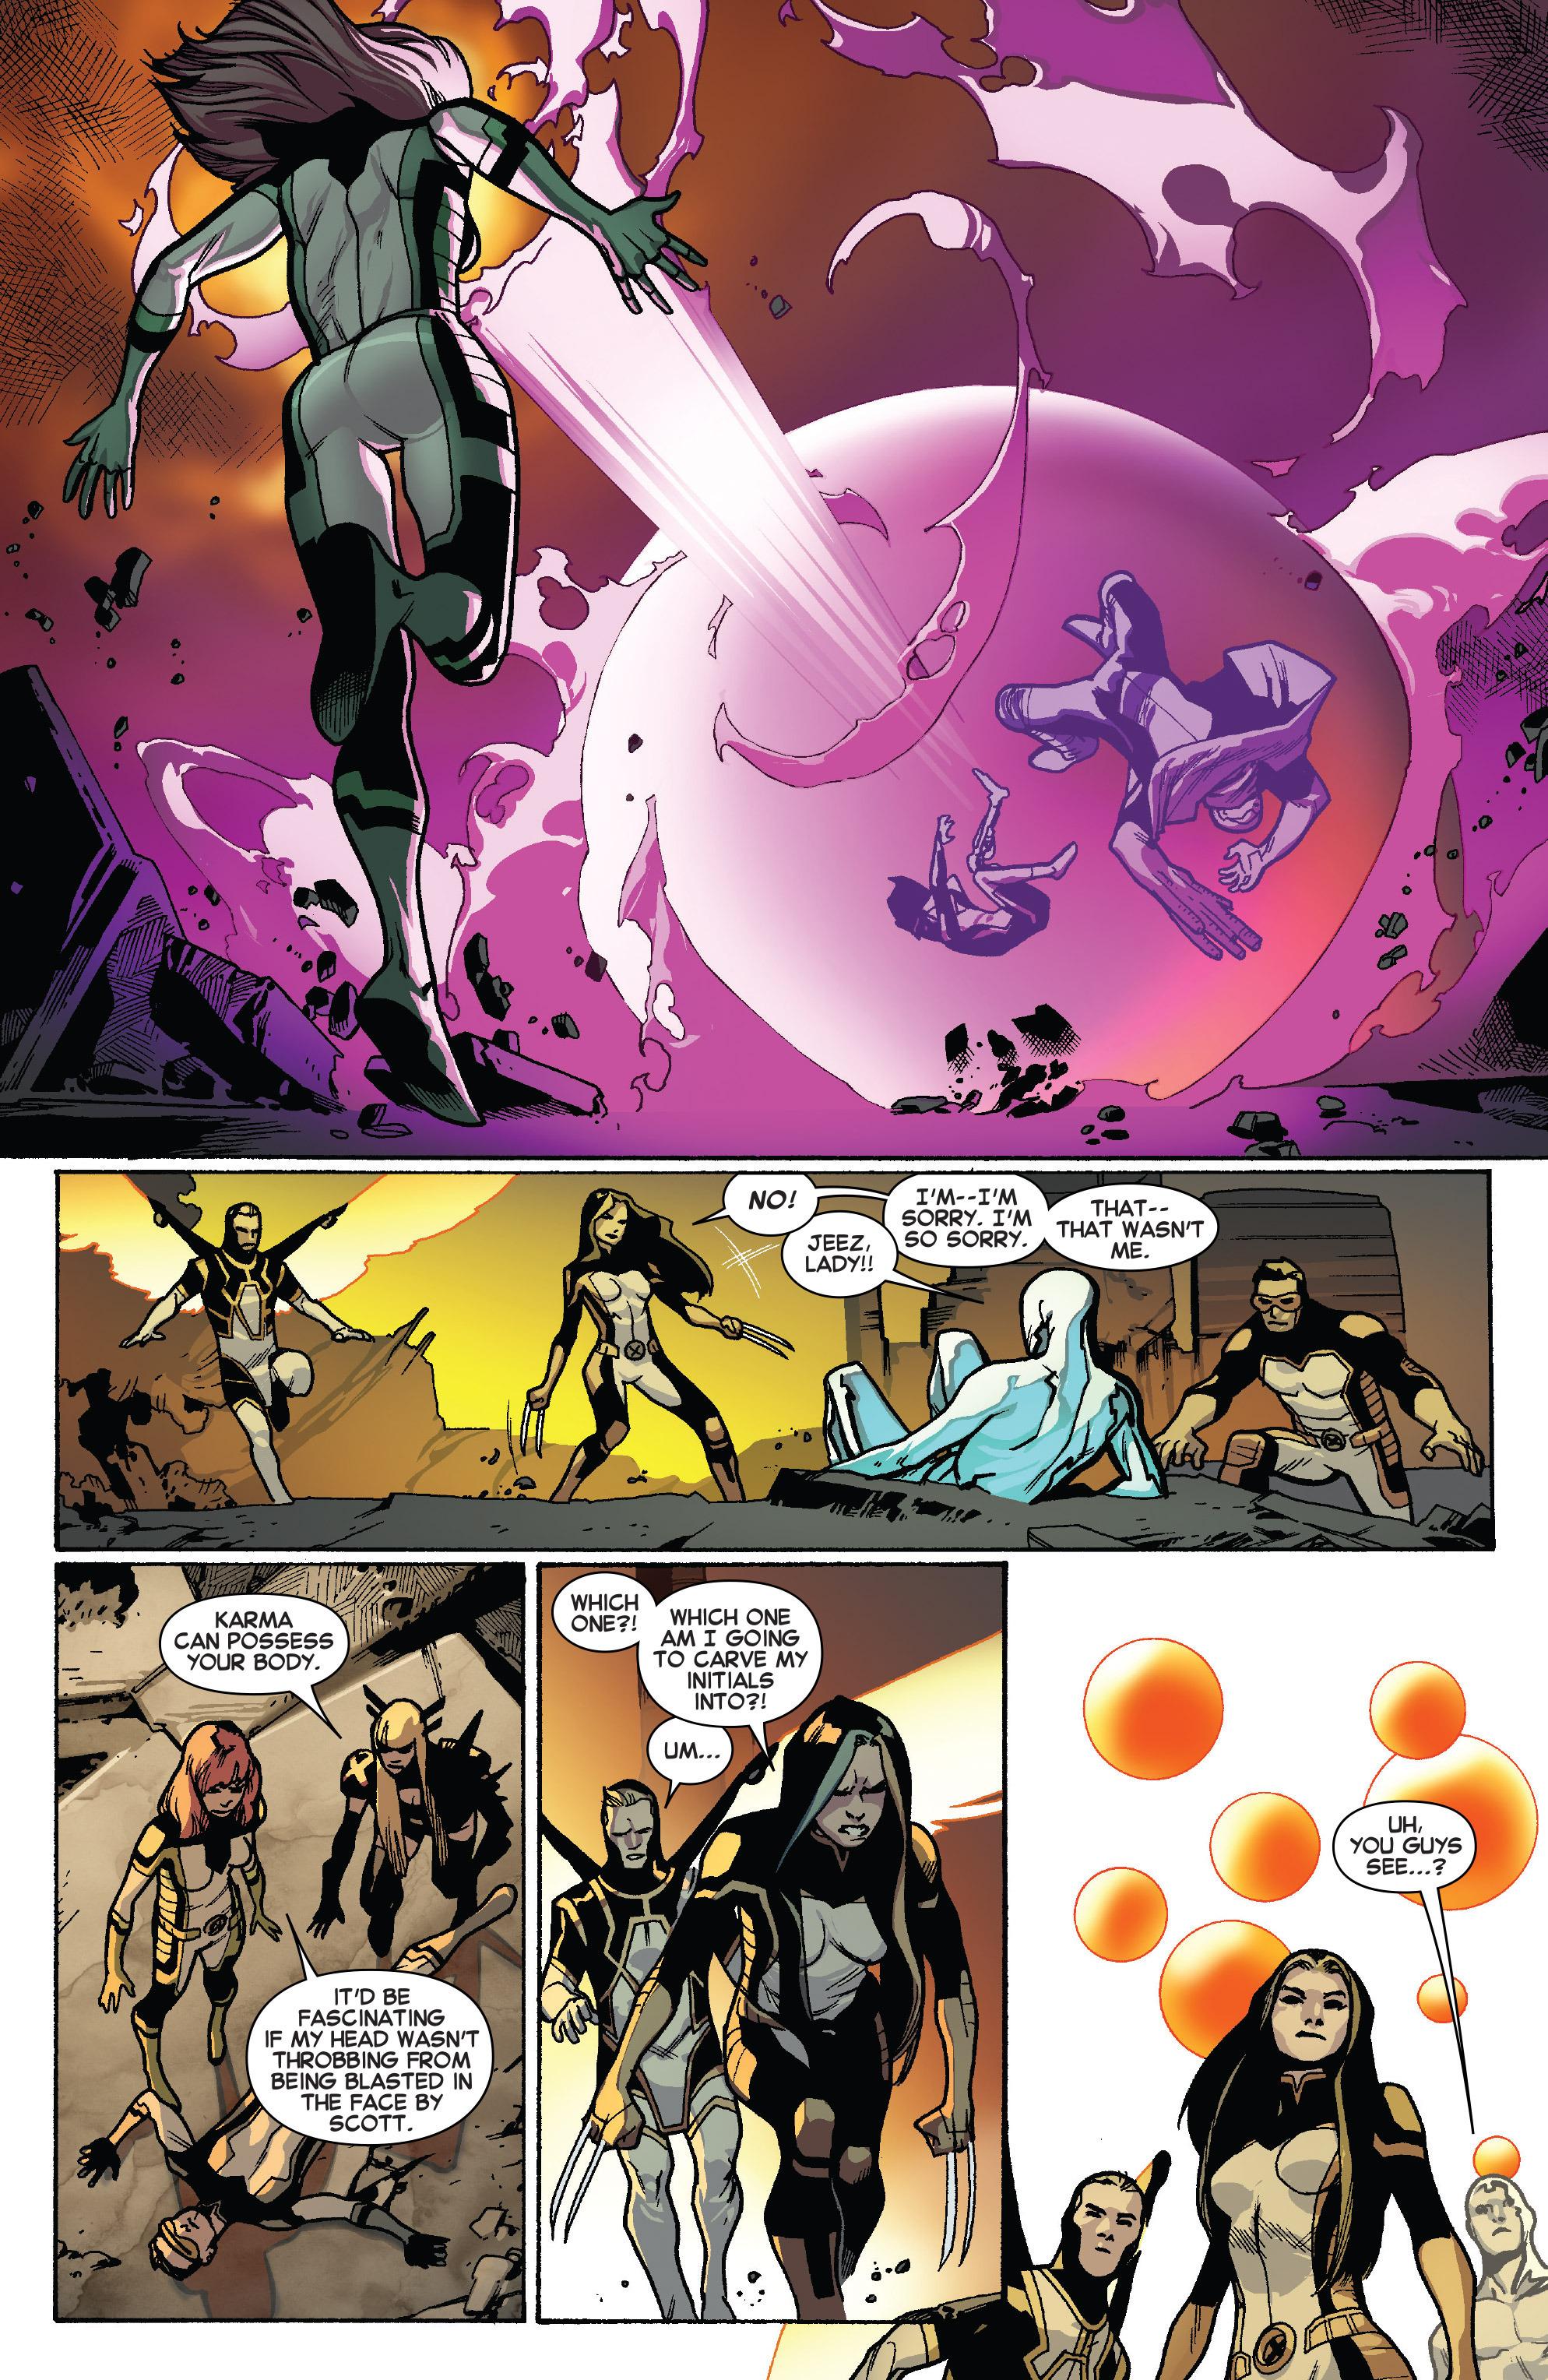 All-New X-Men (2013) chap 41 pic 13